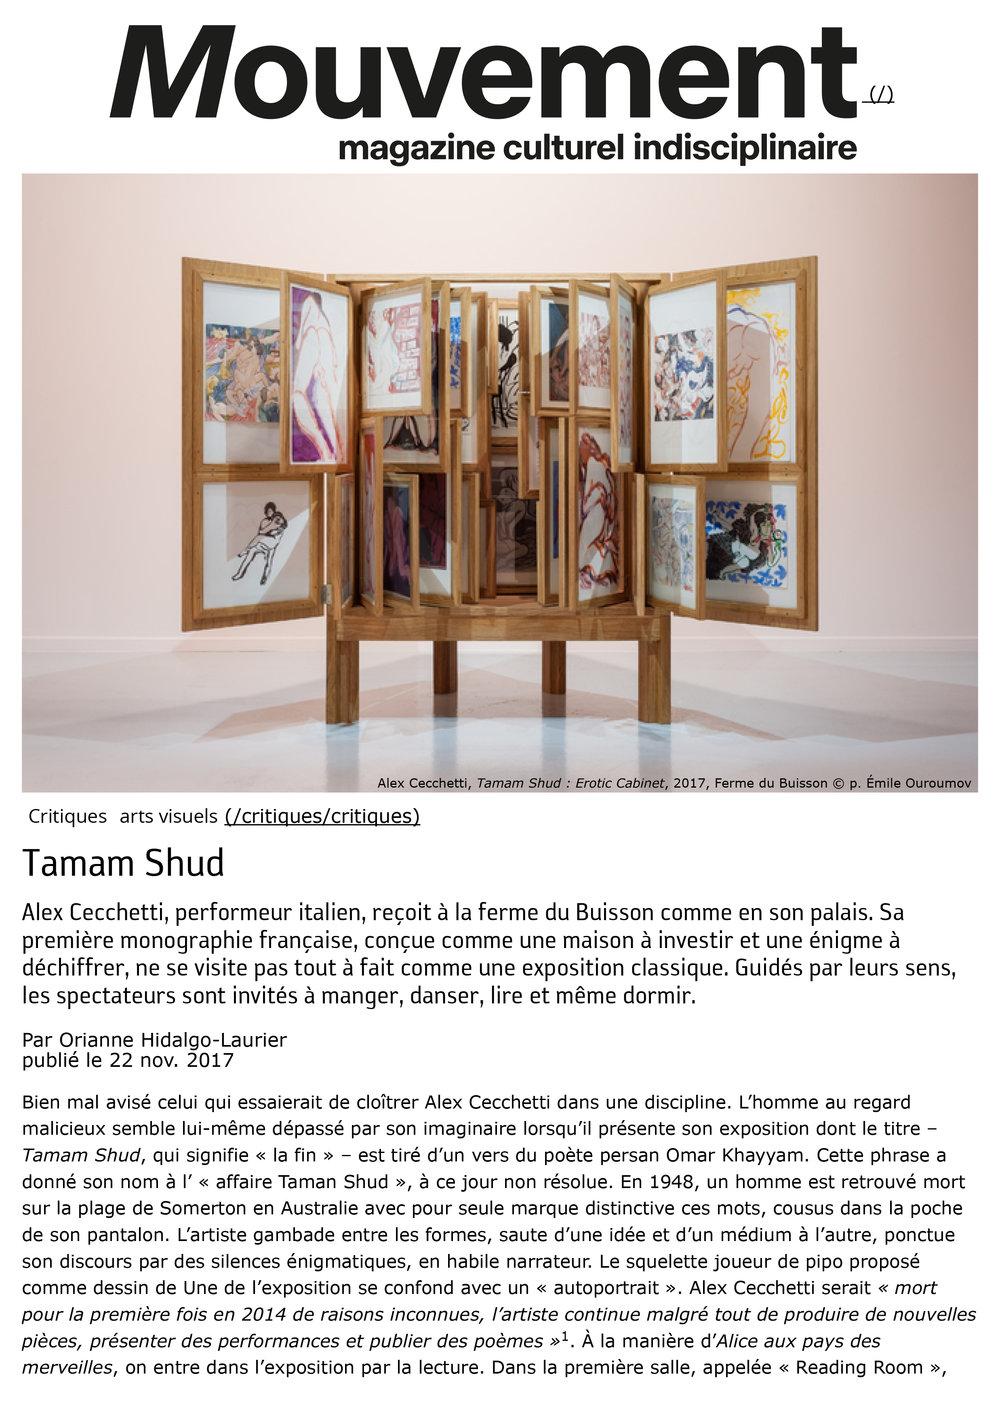 Tamam Shud - Critiques - mouvement-1.jpg